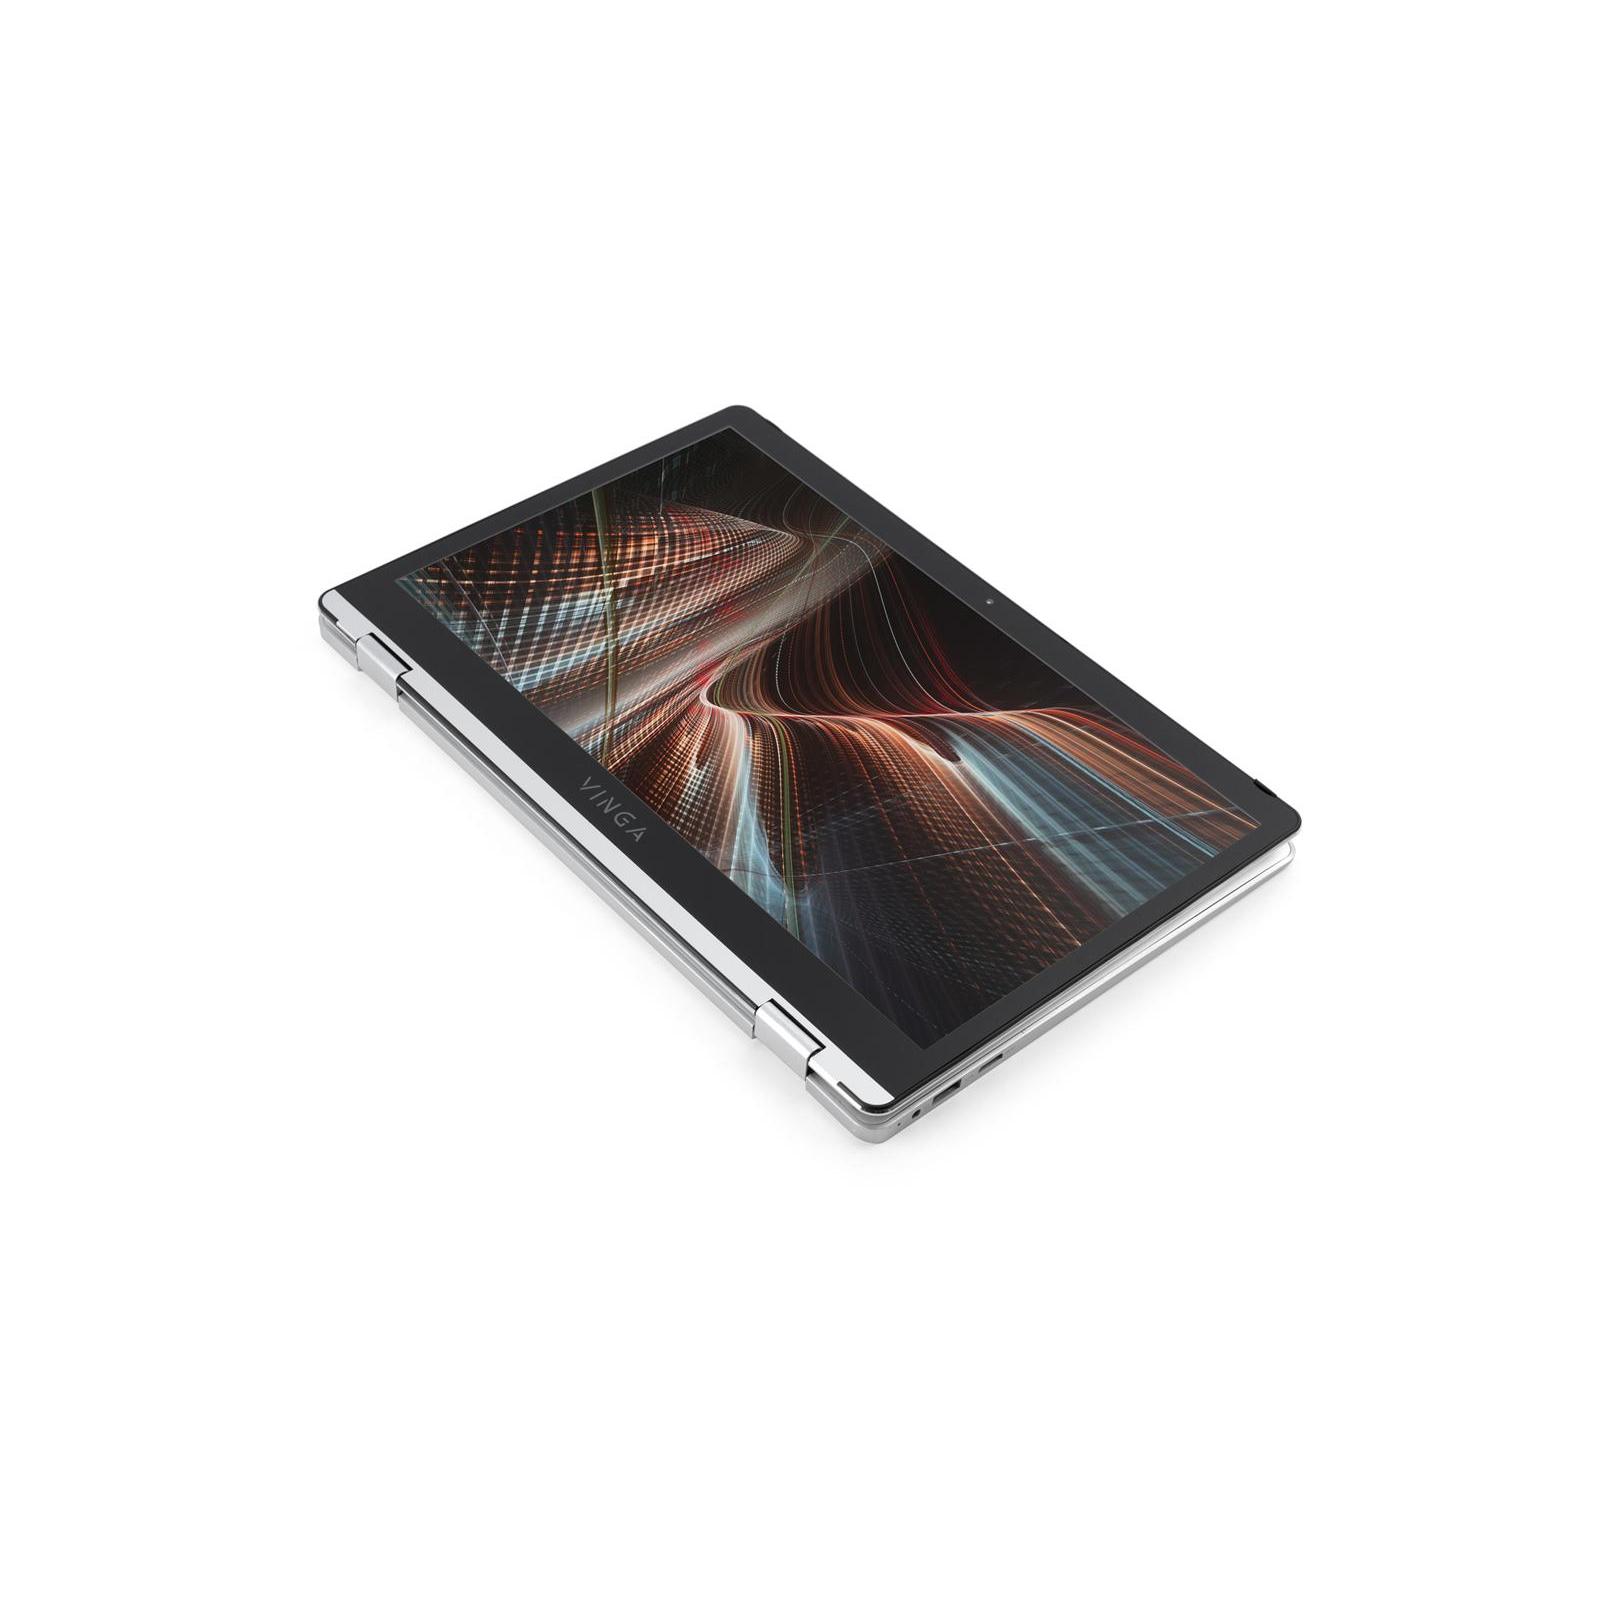 Ноутбук Vinga Twizzle Pen J133 (J133-C33464PS) изображение 6